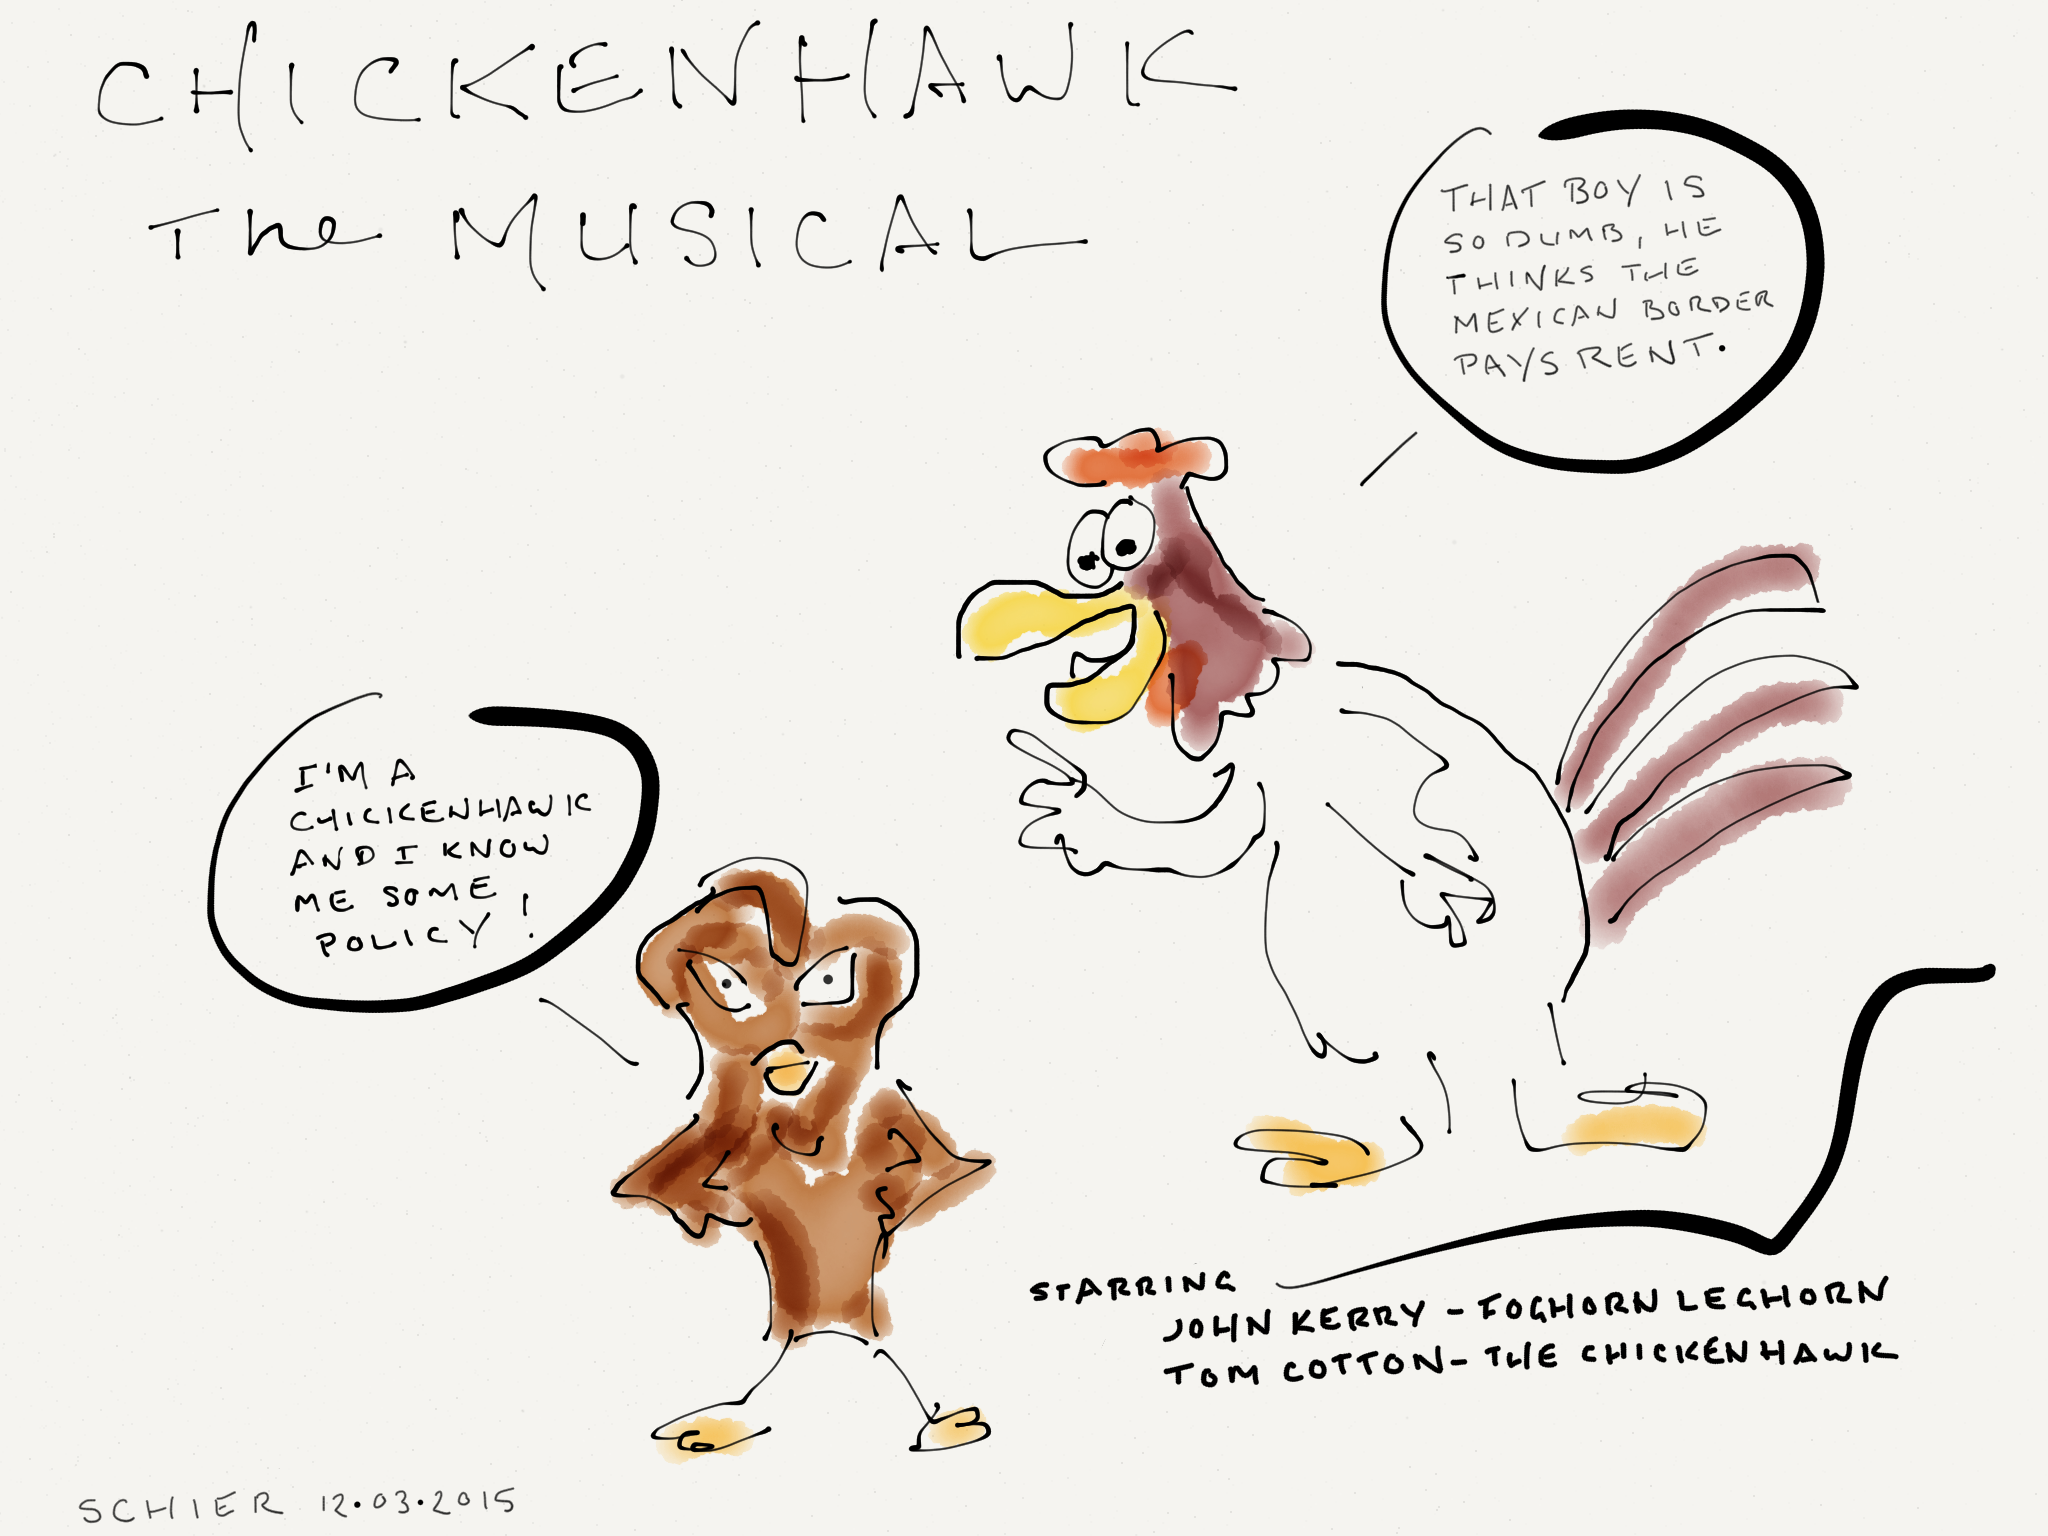 chickenhawk-the-musical